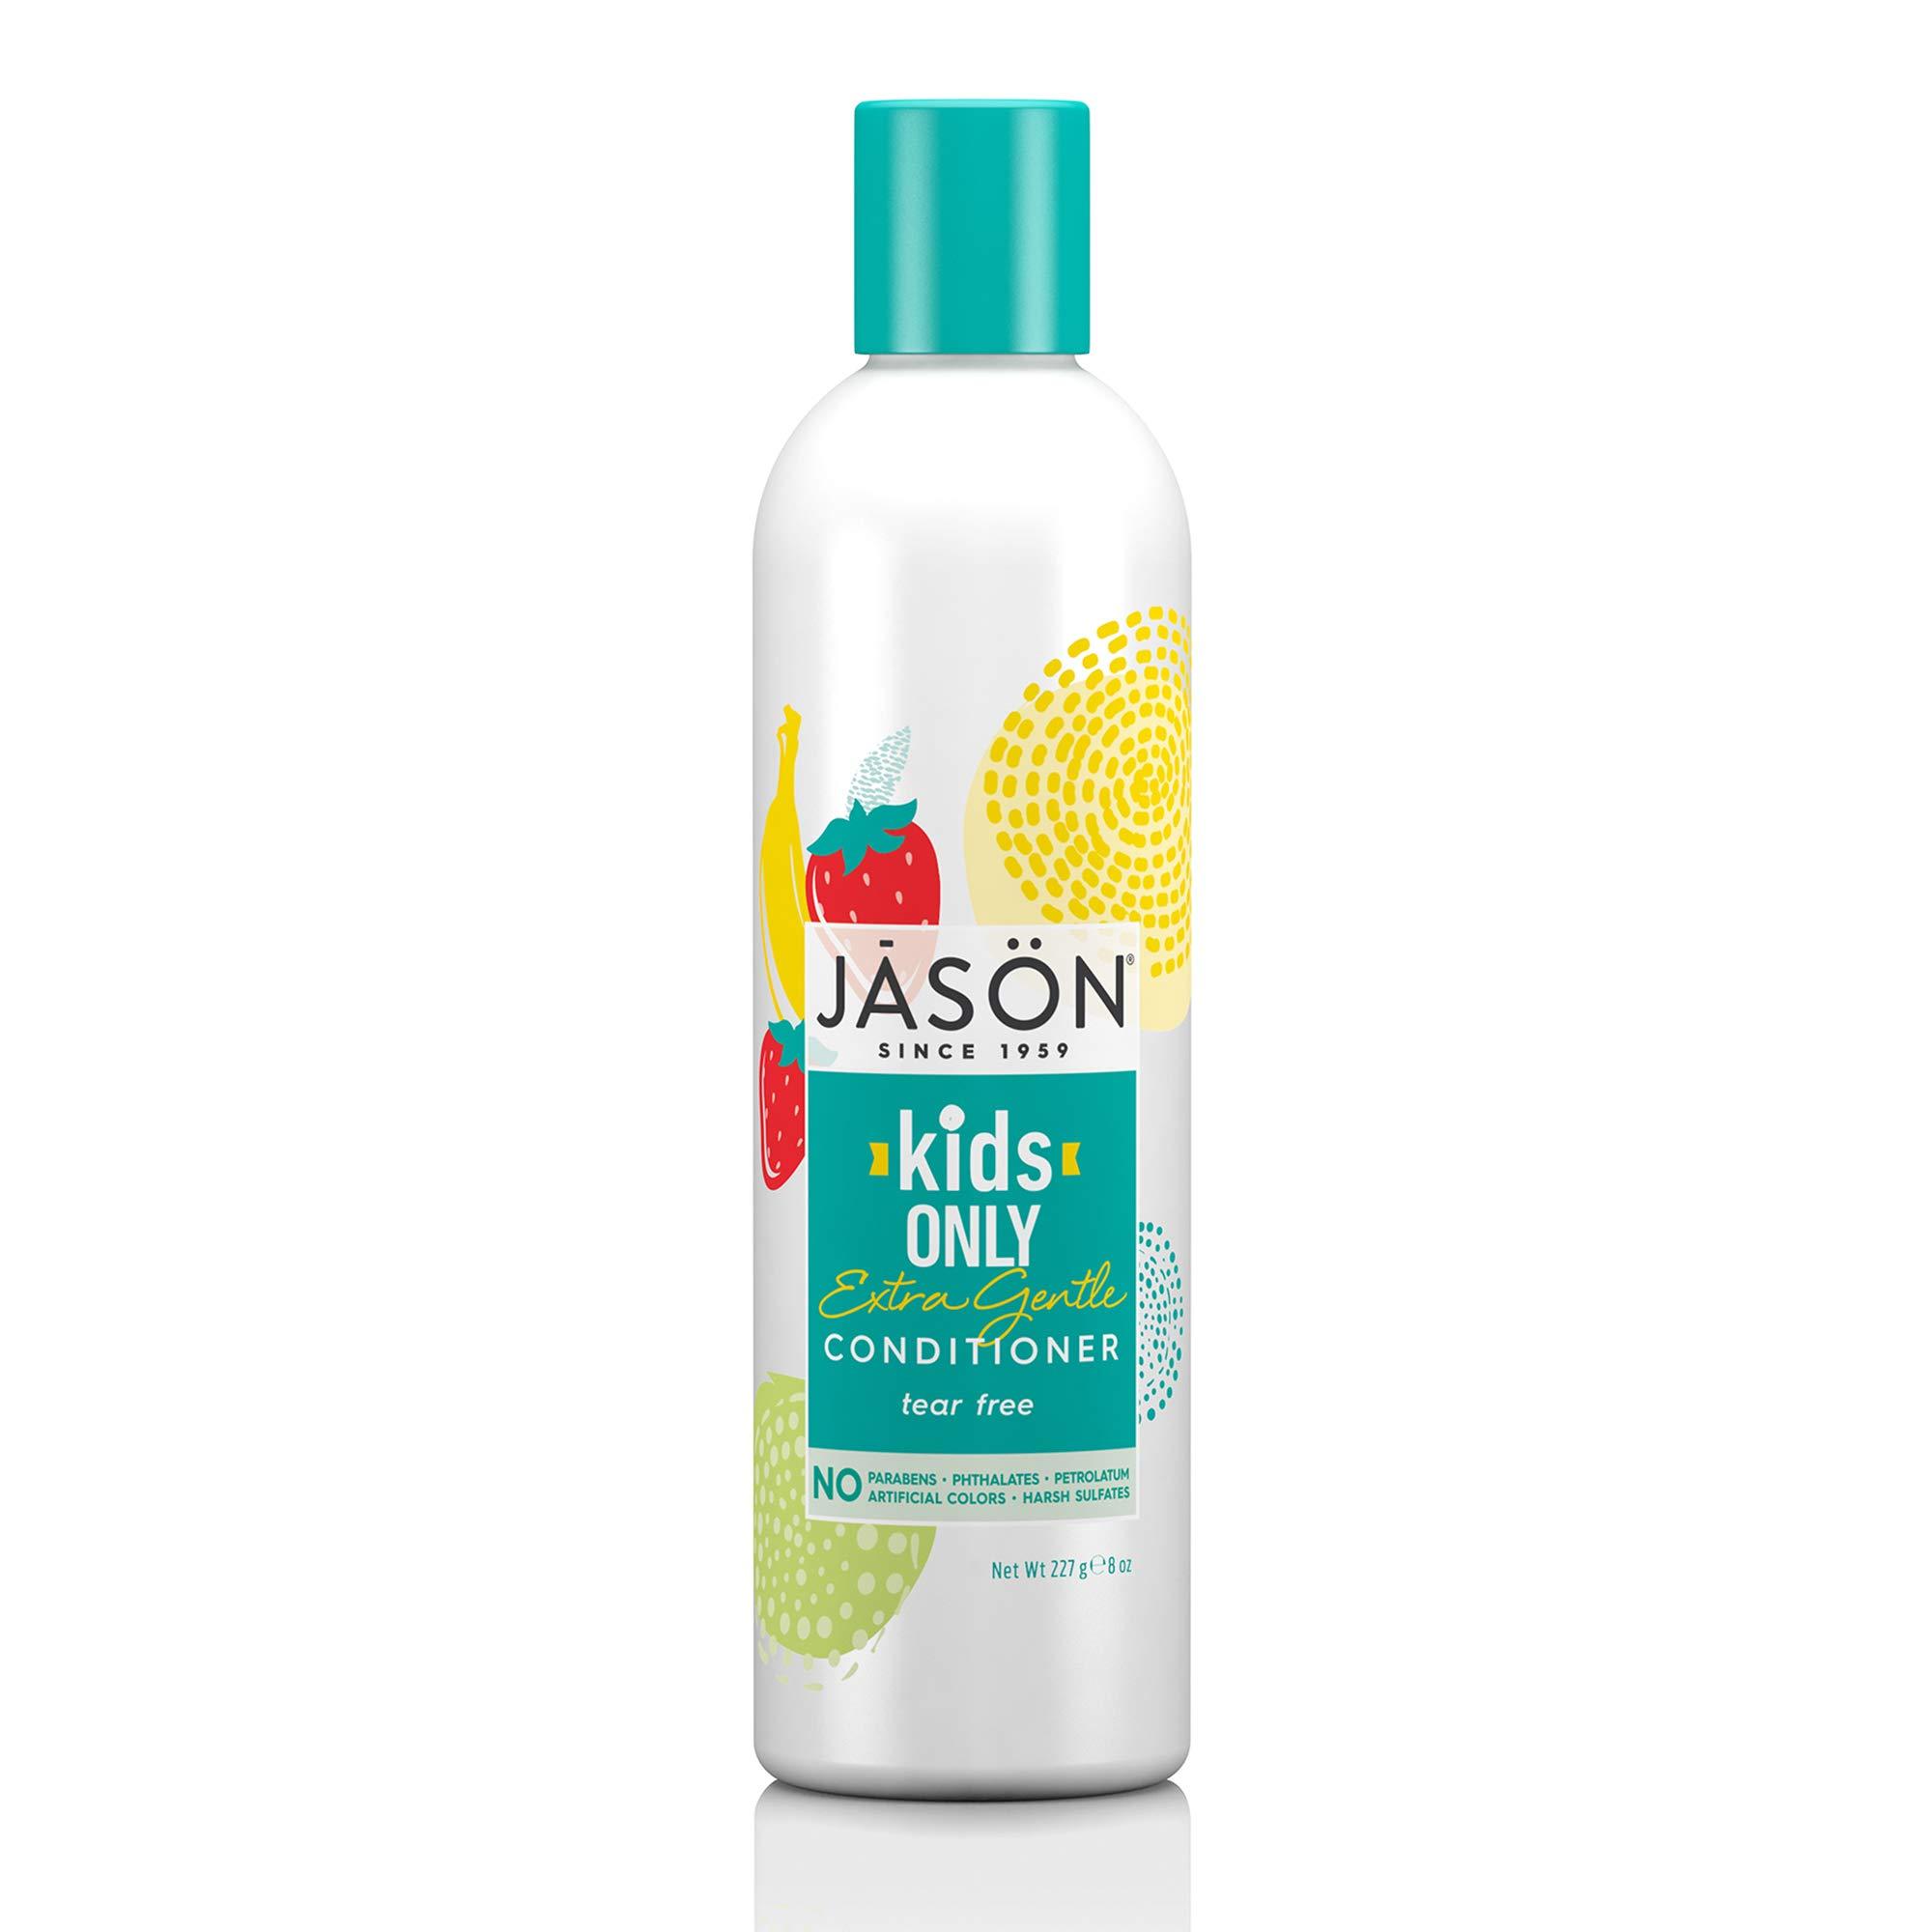 JASON- CONDITIONER KIDS ONLY